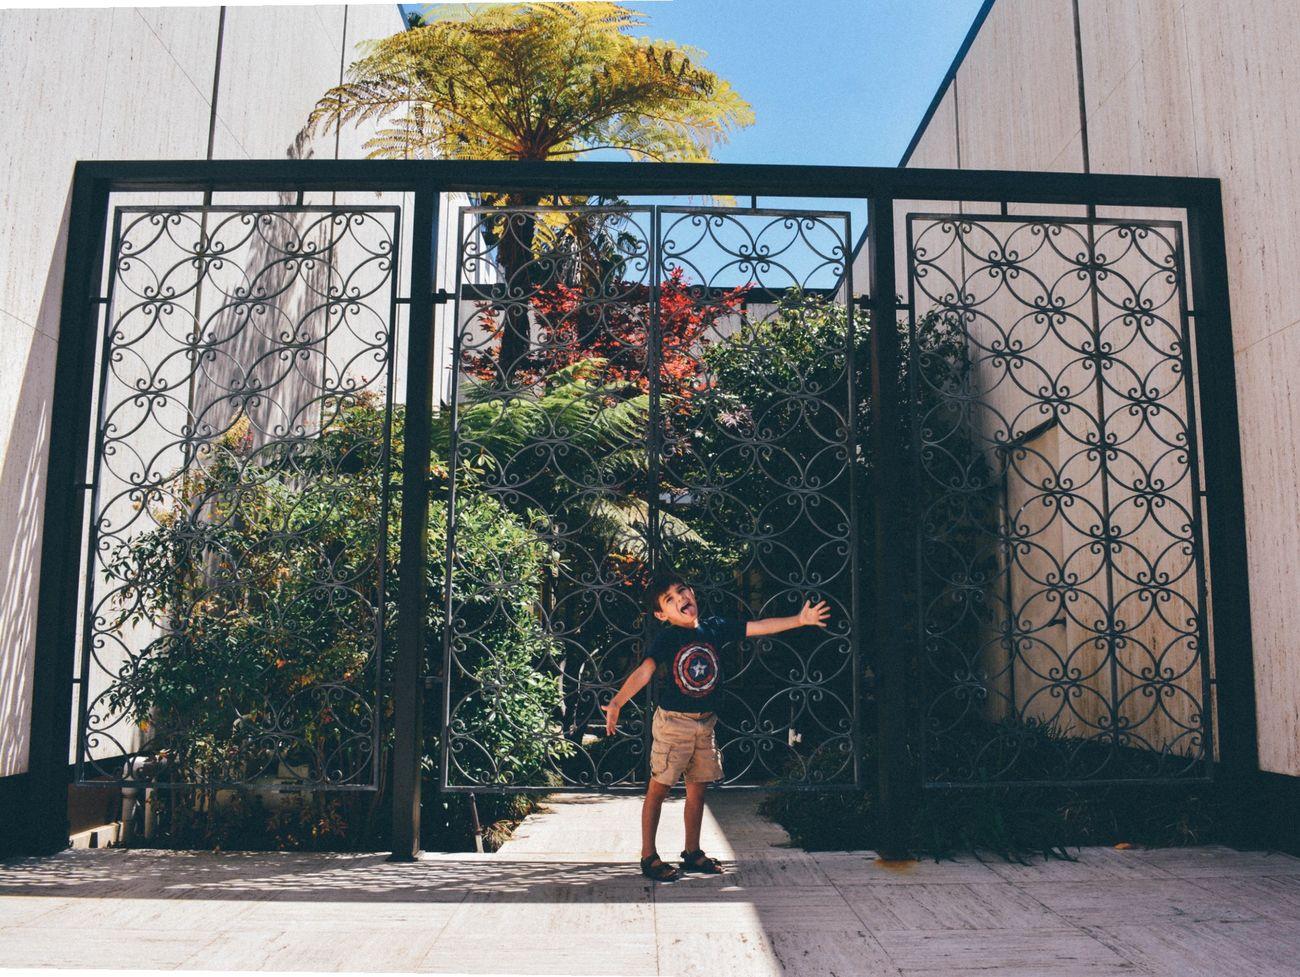 Ham Balboa Park Sandiego Snapshots Of Life